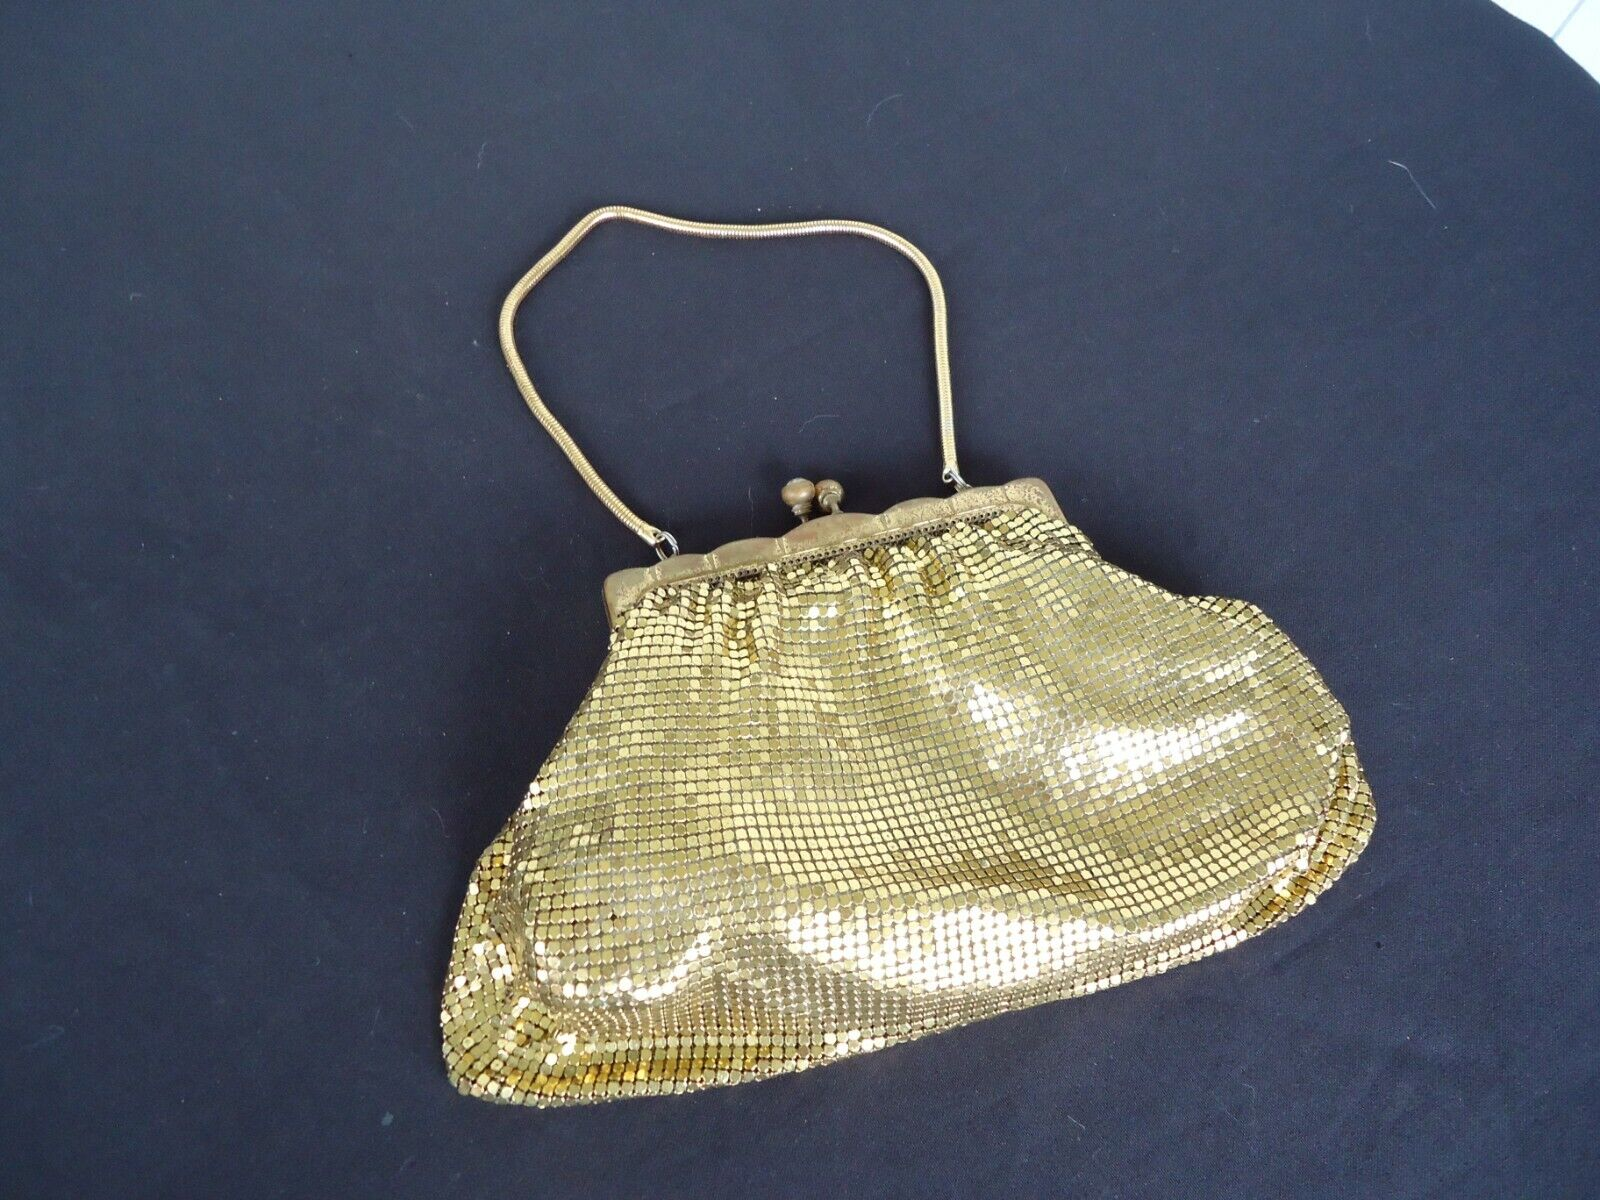 vintage art deco retro gold glomesh handbag evening bag diamond clasp